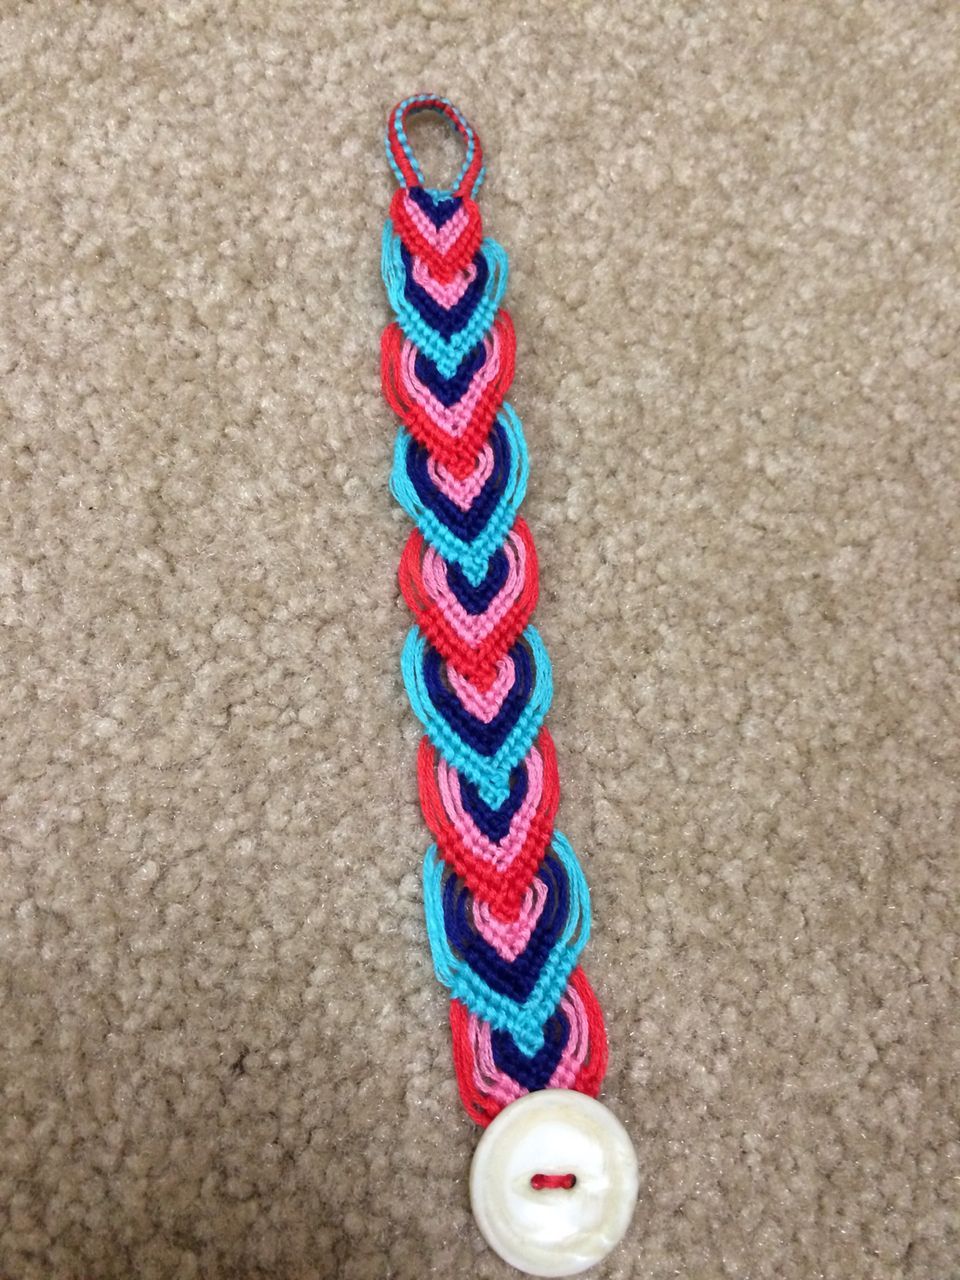 Image53g 9601280 Pixels Embroidery Floss Bracelets